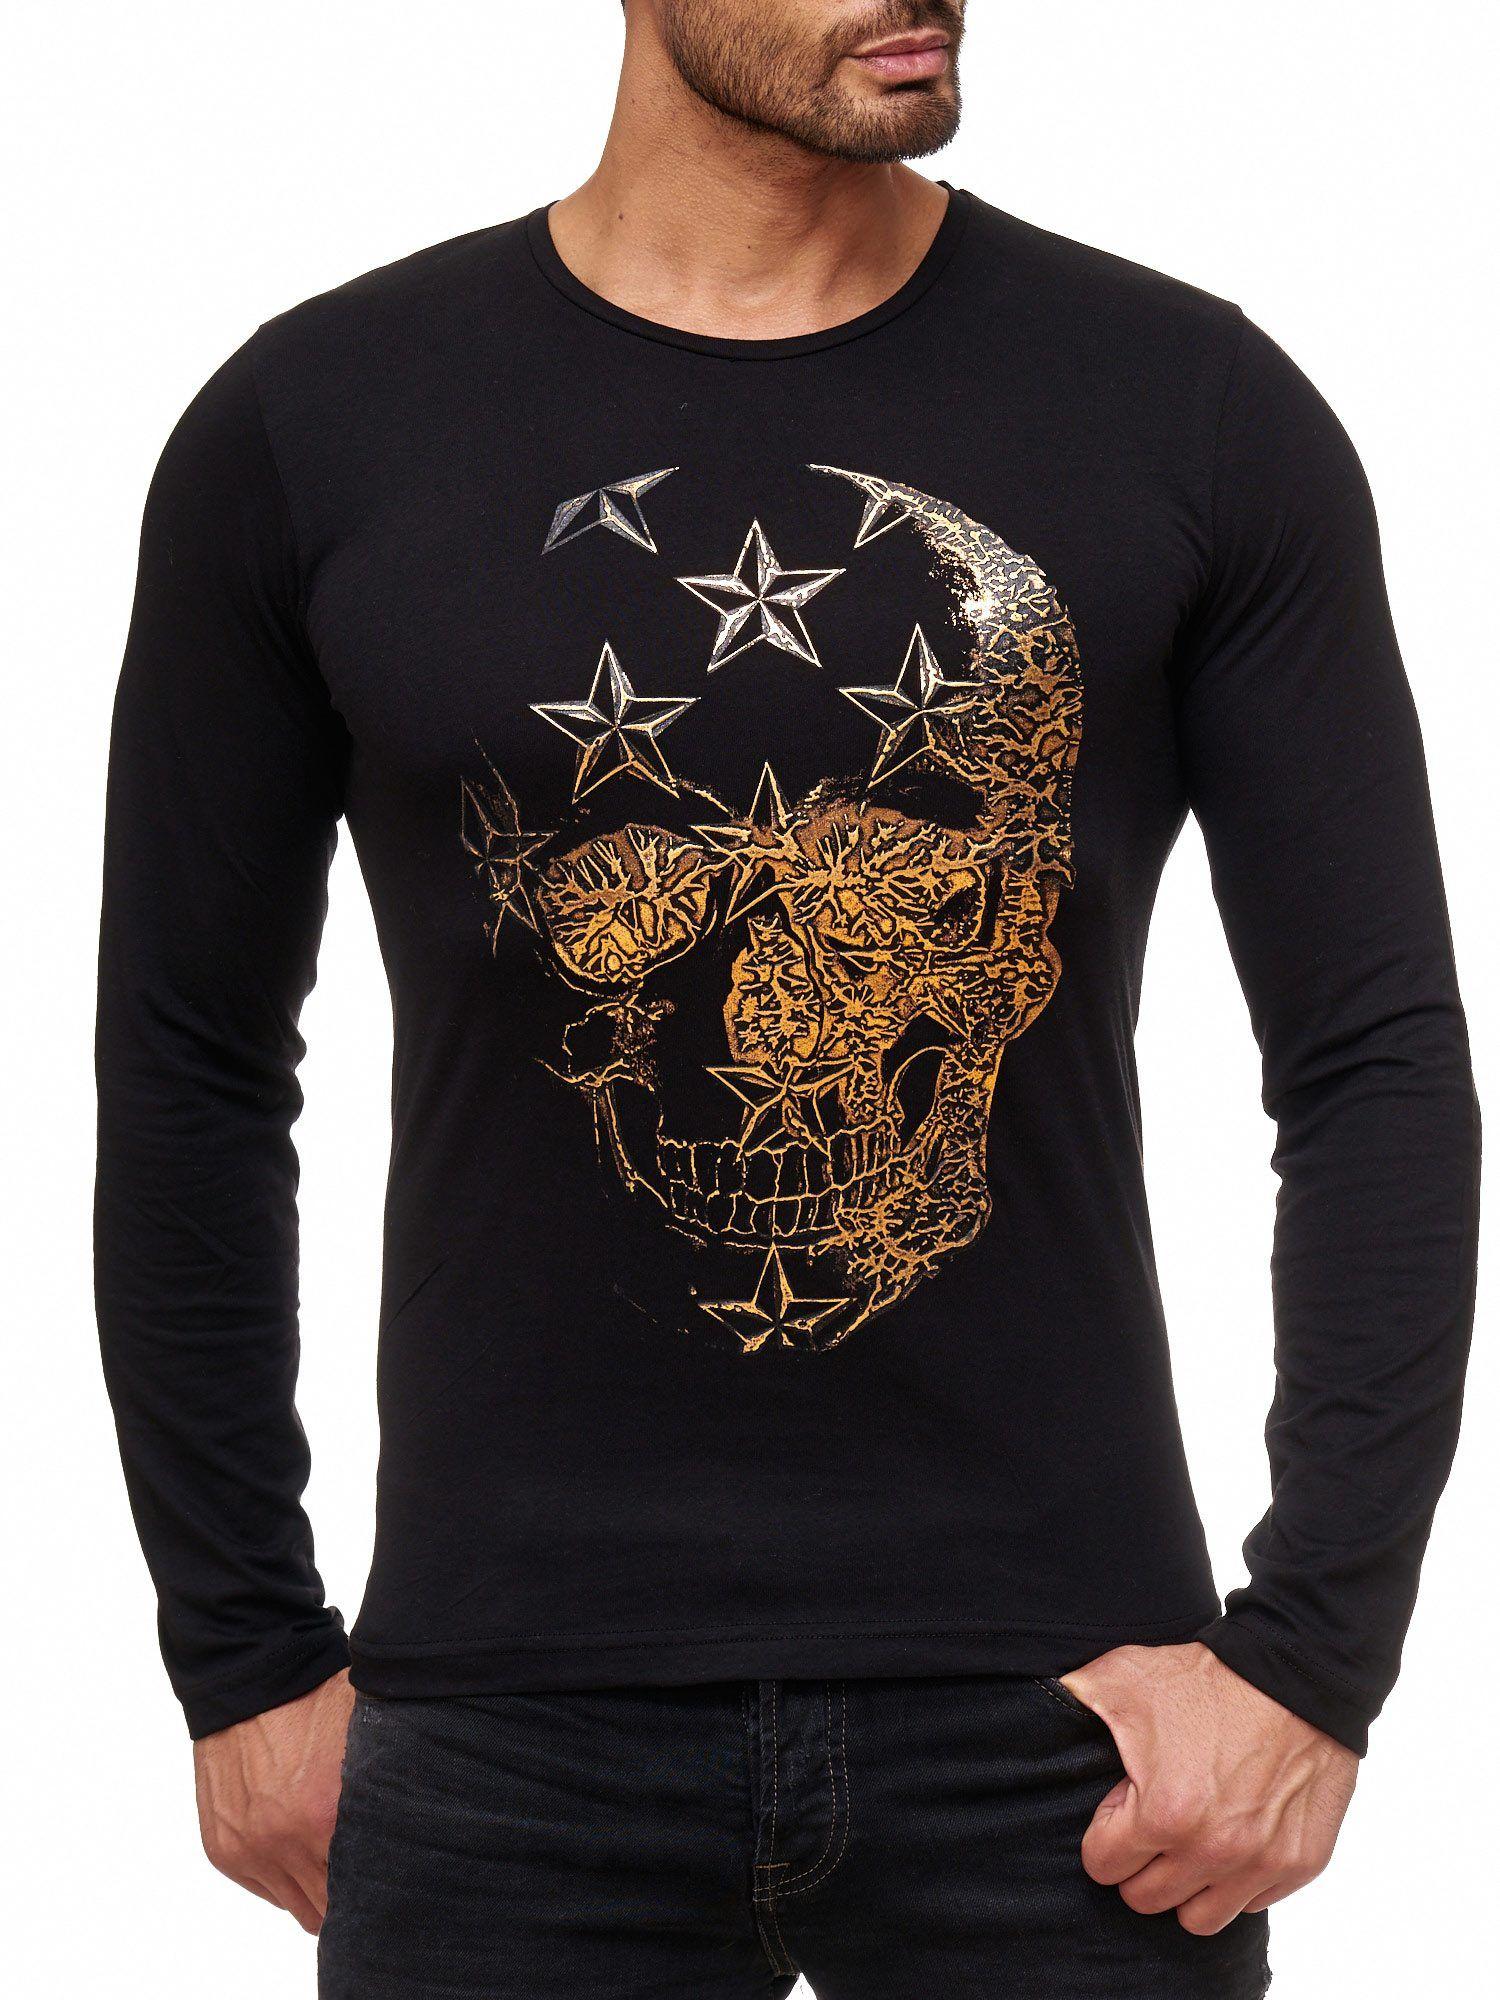 bd16a73a1b6f Red Bridge Herren Skull Star Motiv Longsleeve Pullover Langarm T-Shirt  Schwarz  skull